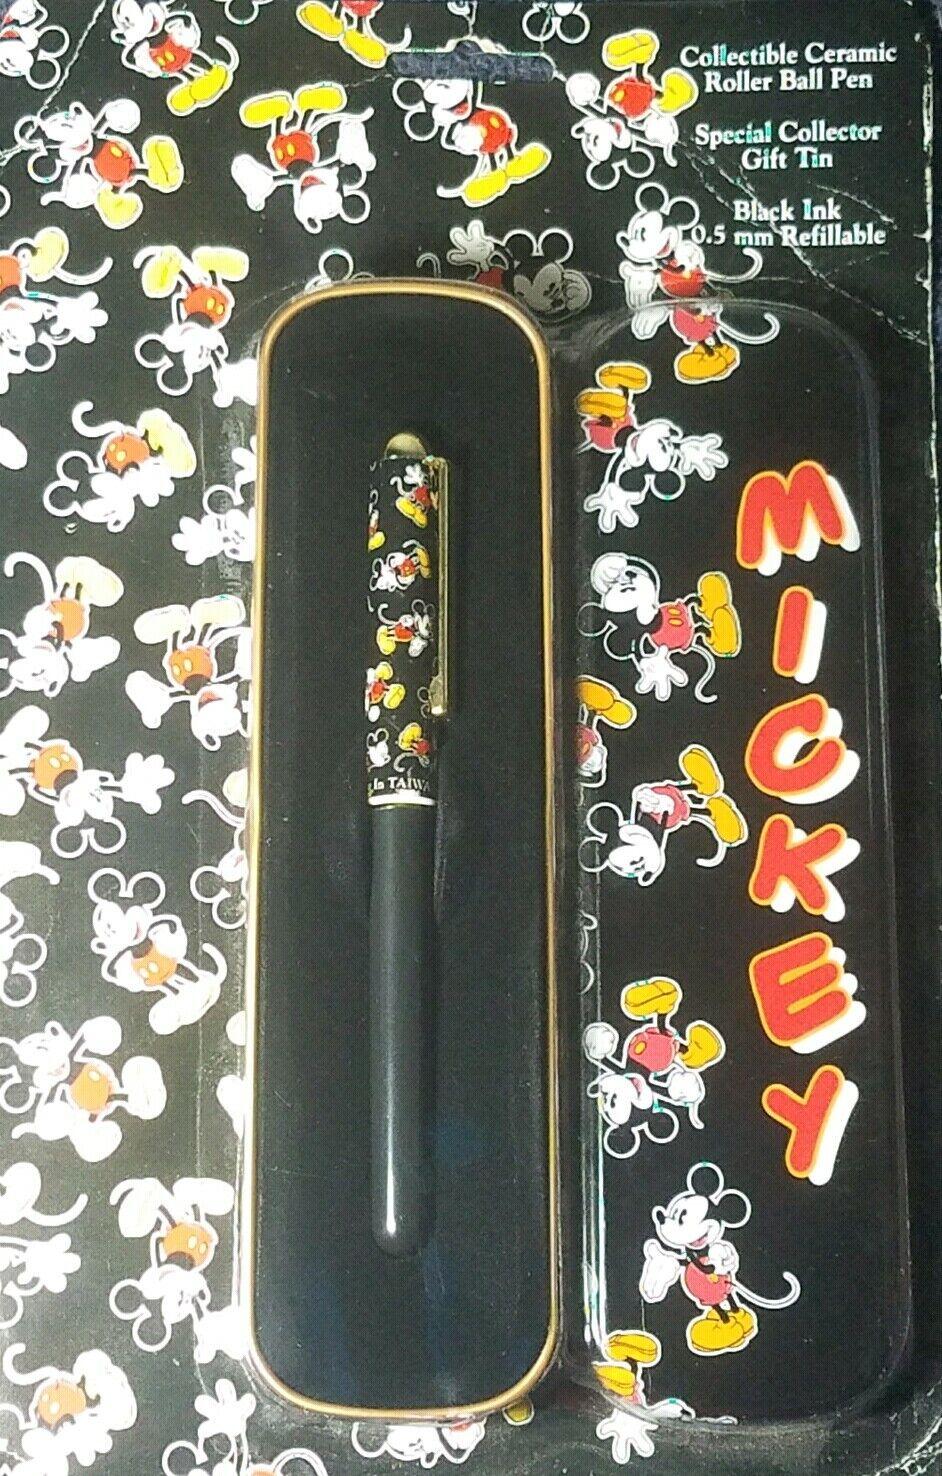 entrega rápida Papel De De De Mickey Regalo de cerámica de pluma de bola de rodillo Company Tin Vintage ReCochegable